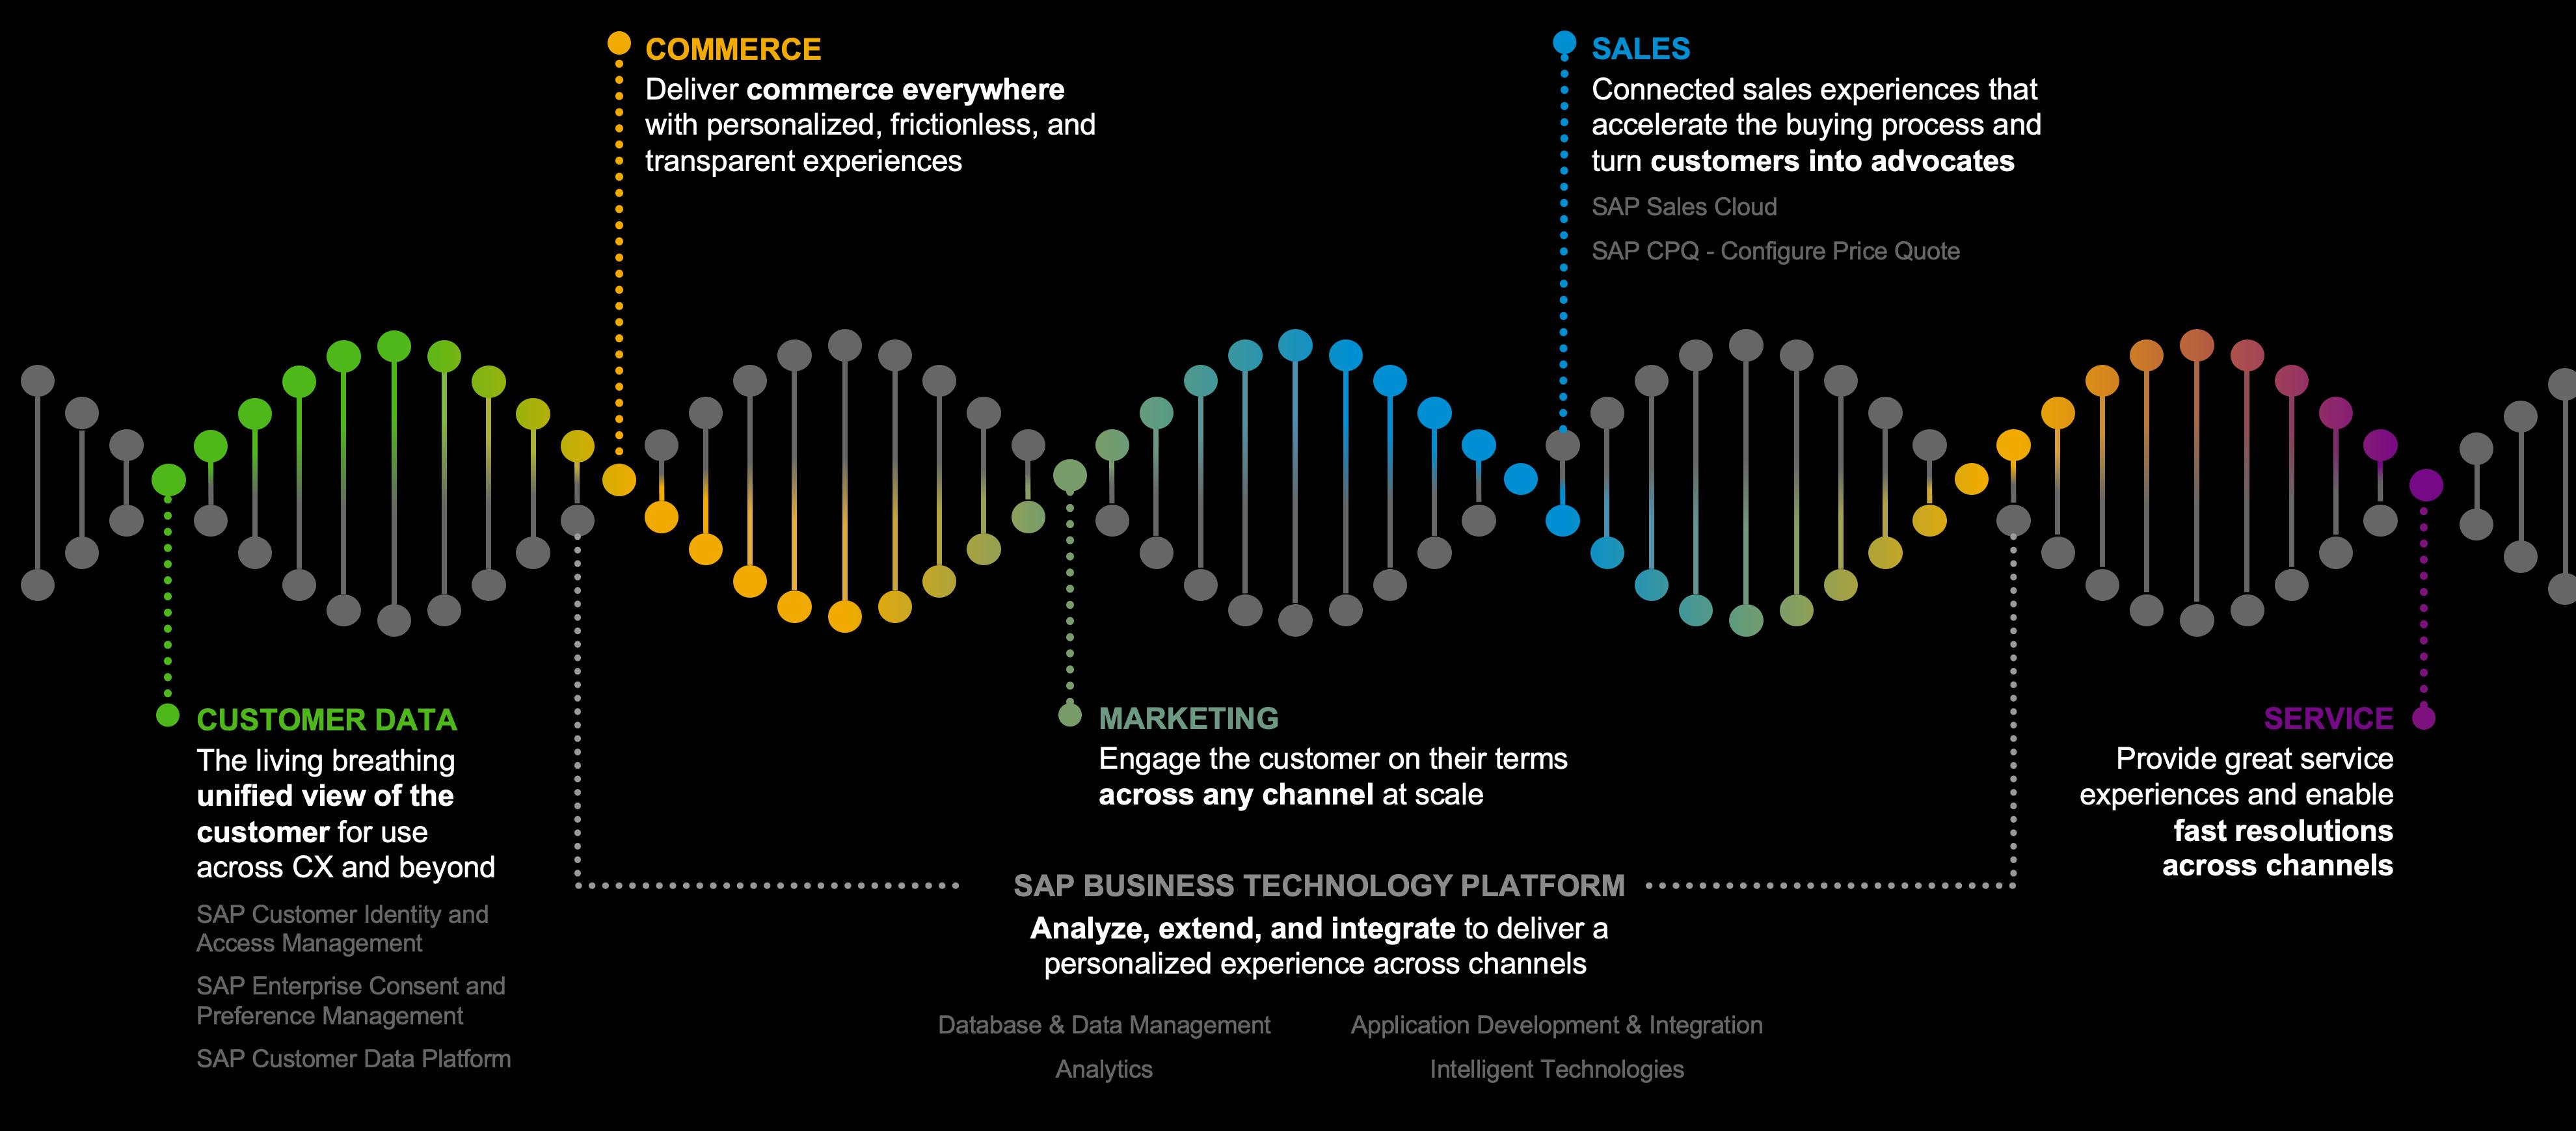 SAP%20Customer%20Experience%20Powered%20by%20SAP%20BTP